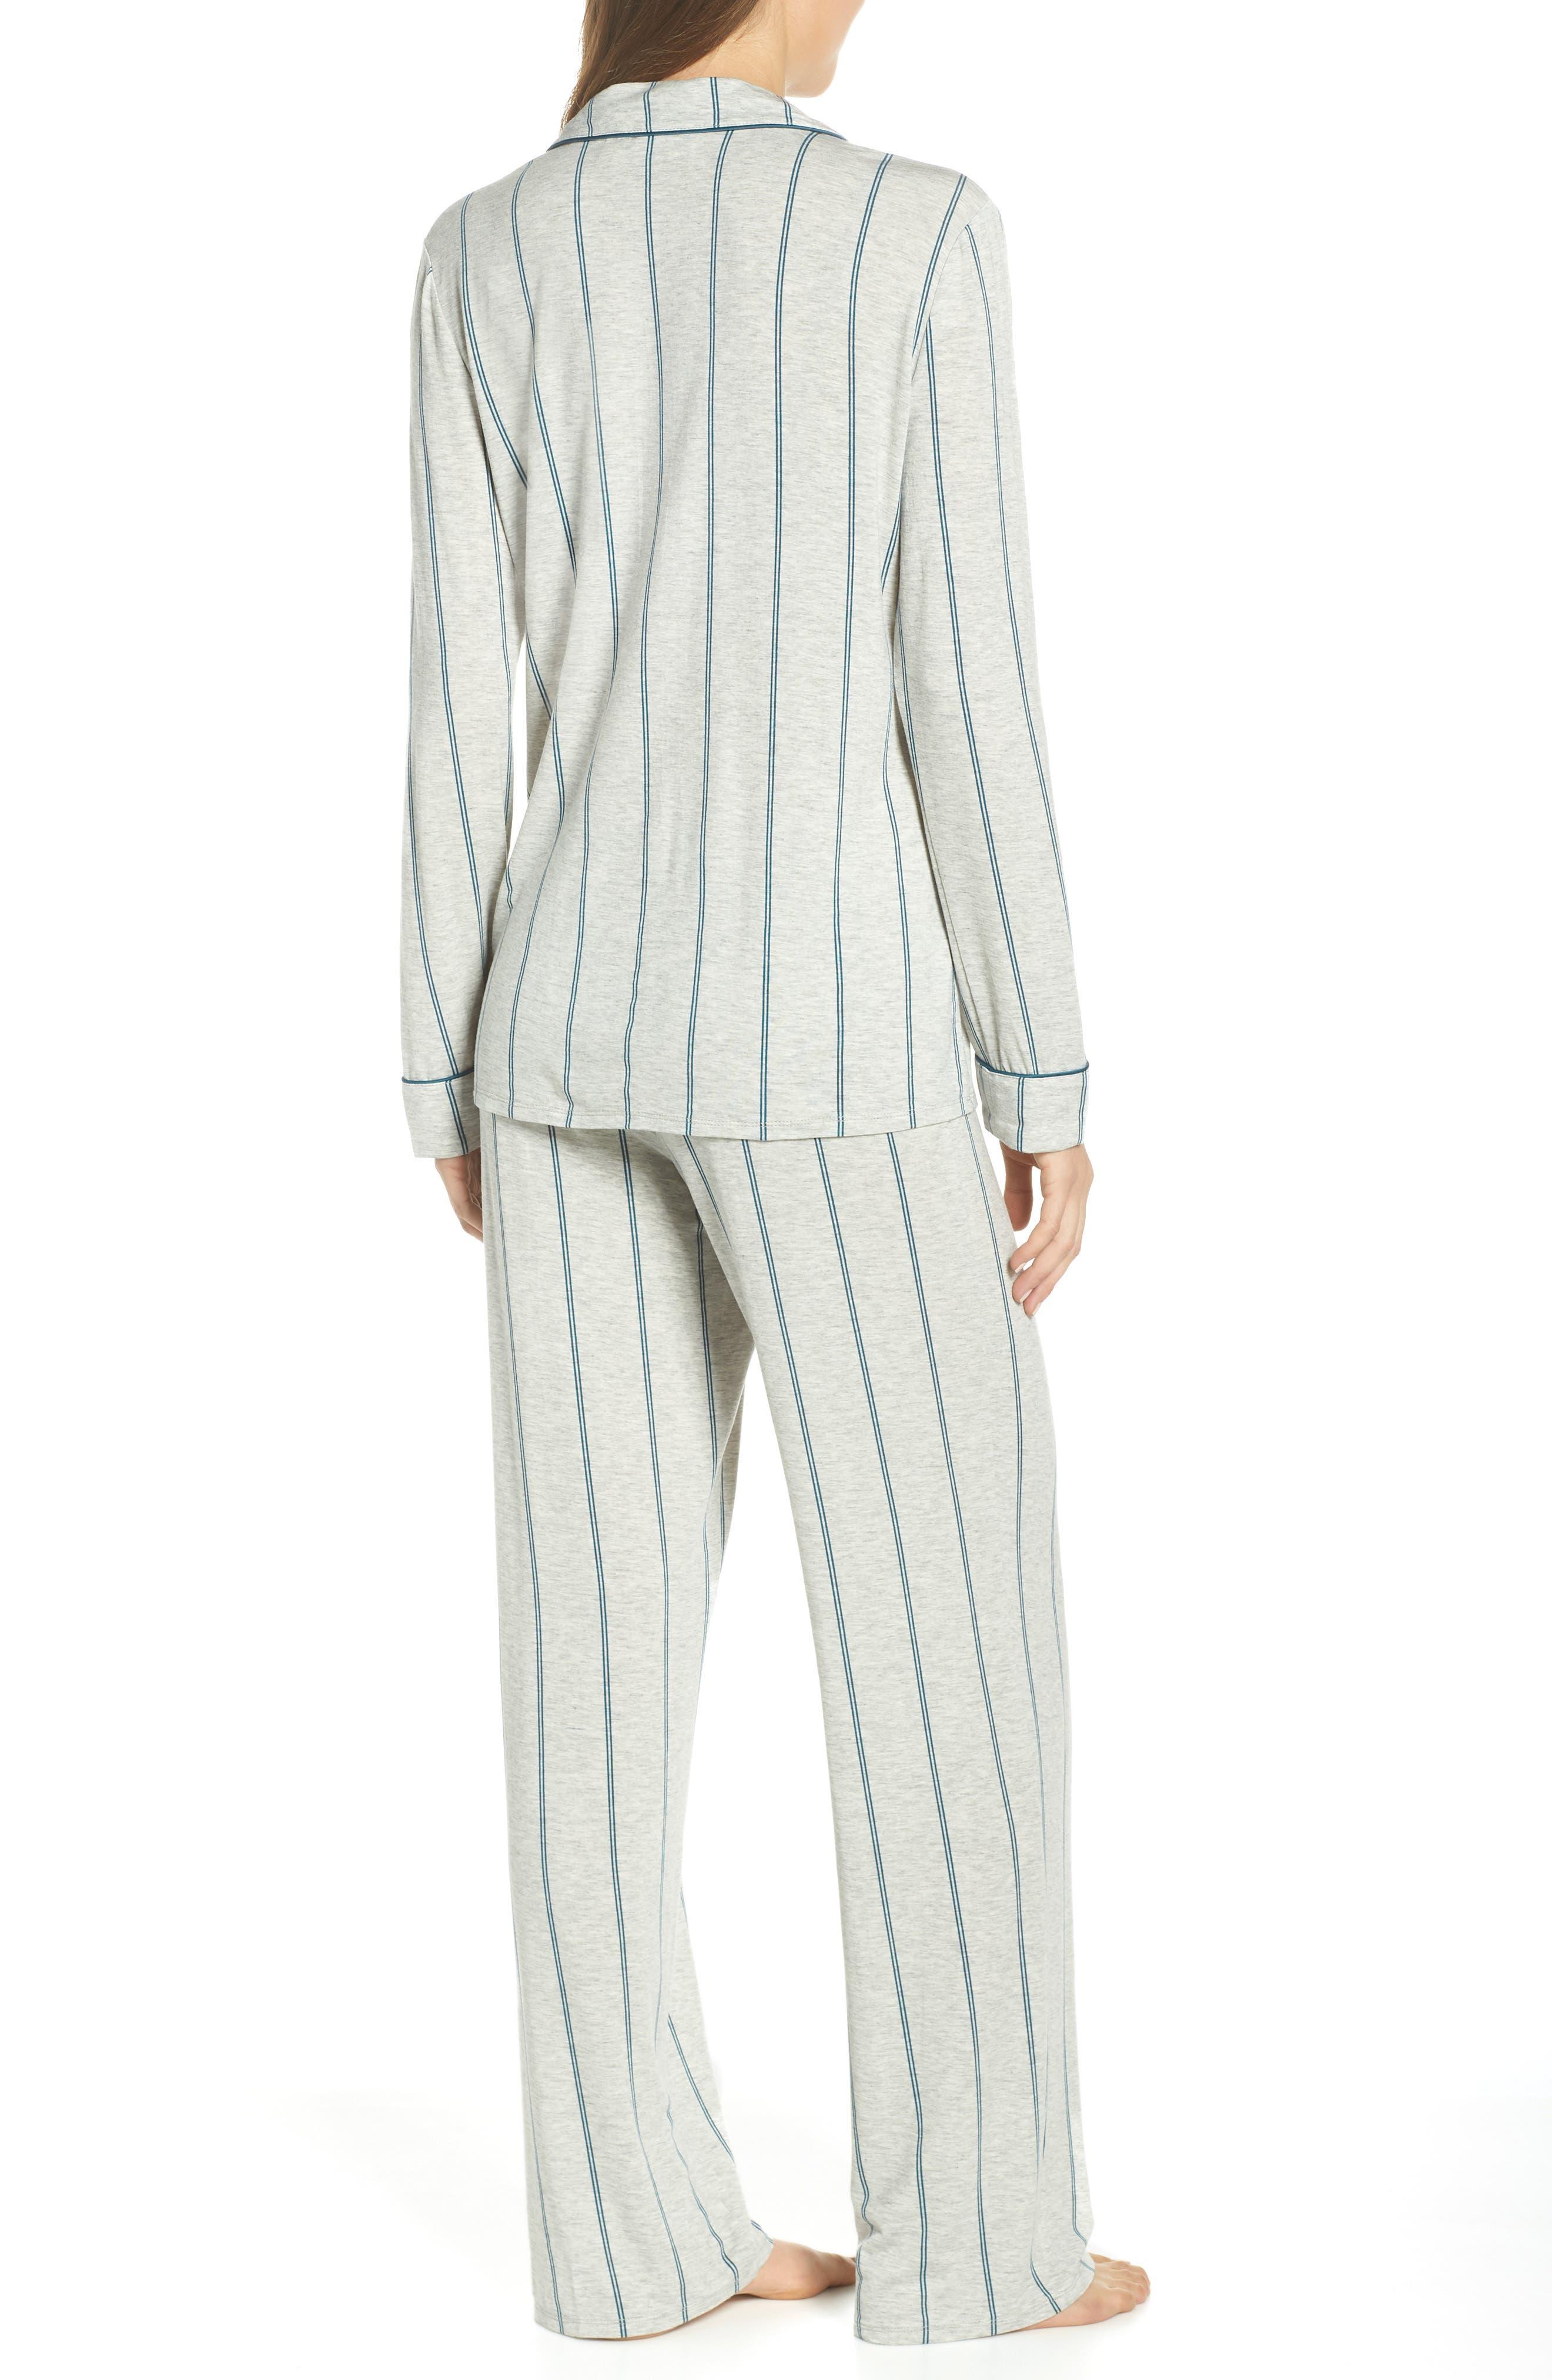 NORDSTROM LINGERIE, Moonlight Pajamas, Alternate thumbnail 2, color, GREY PEARL HEATHER MICROSTRIPE